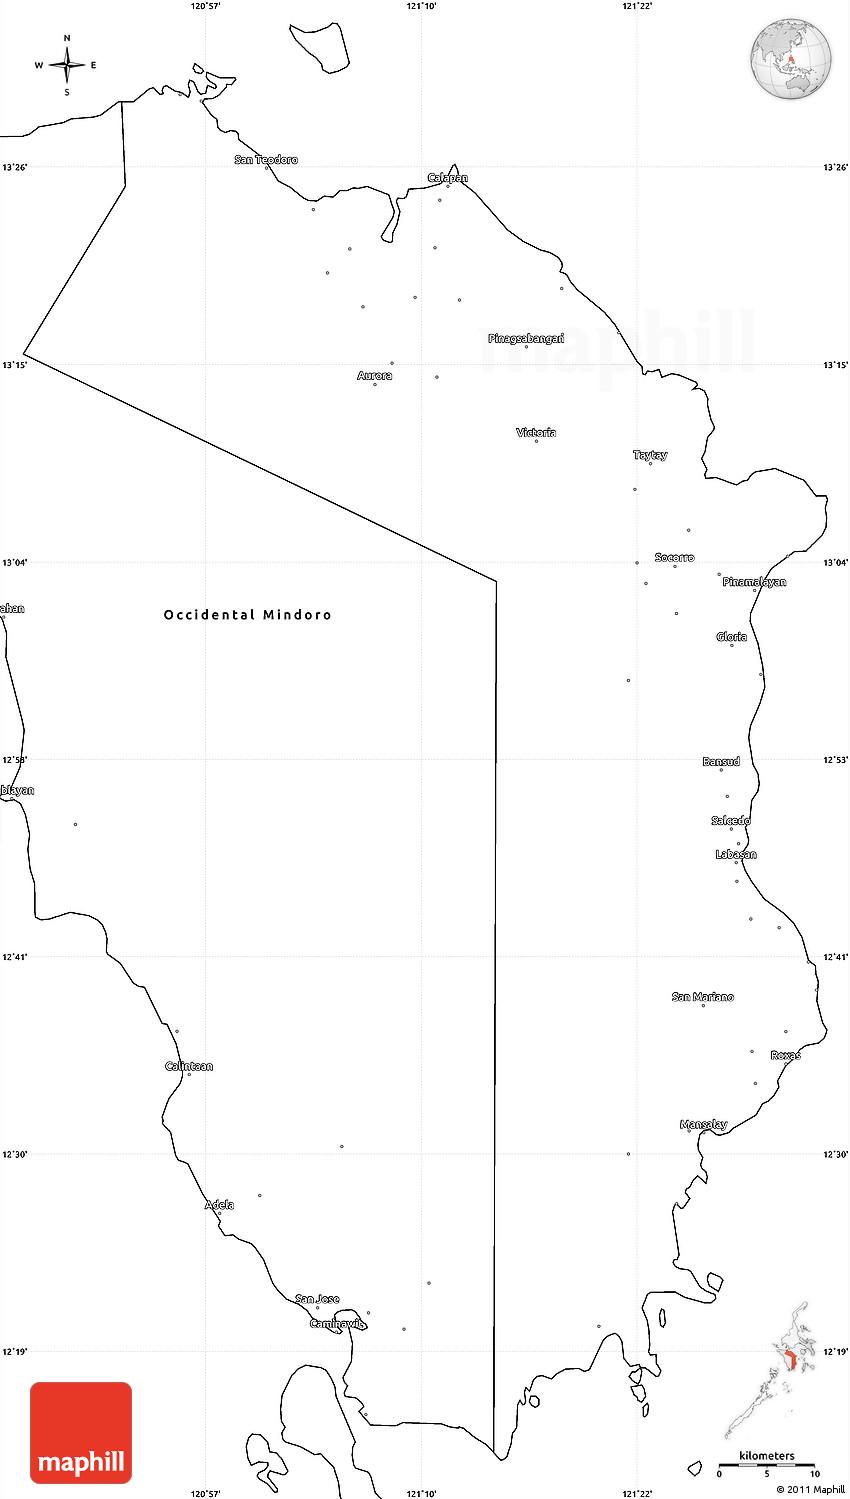 blank simple map of oriental mindoro